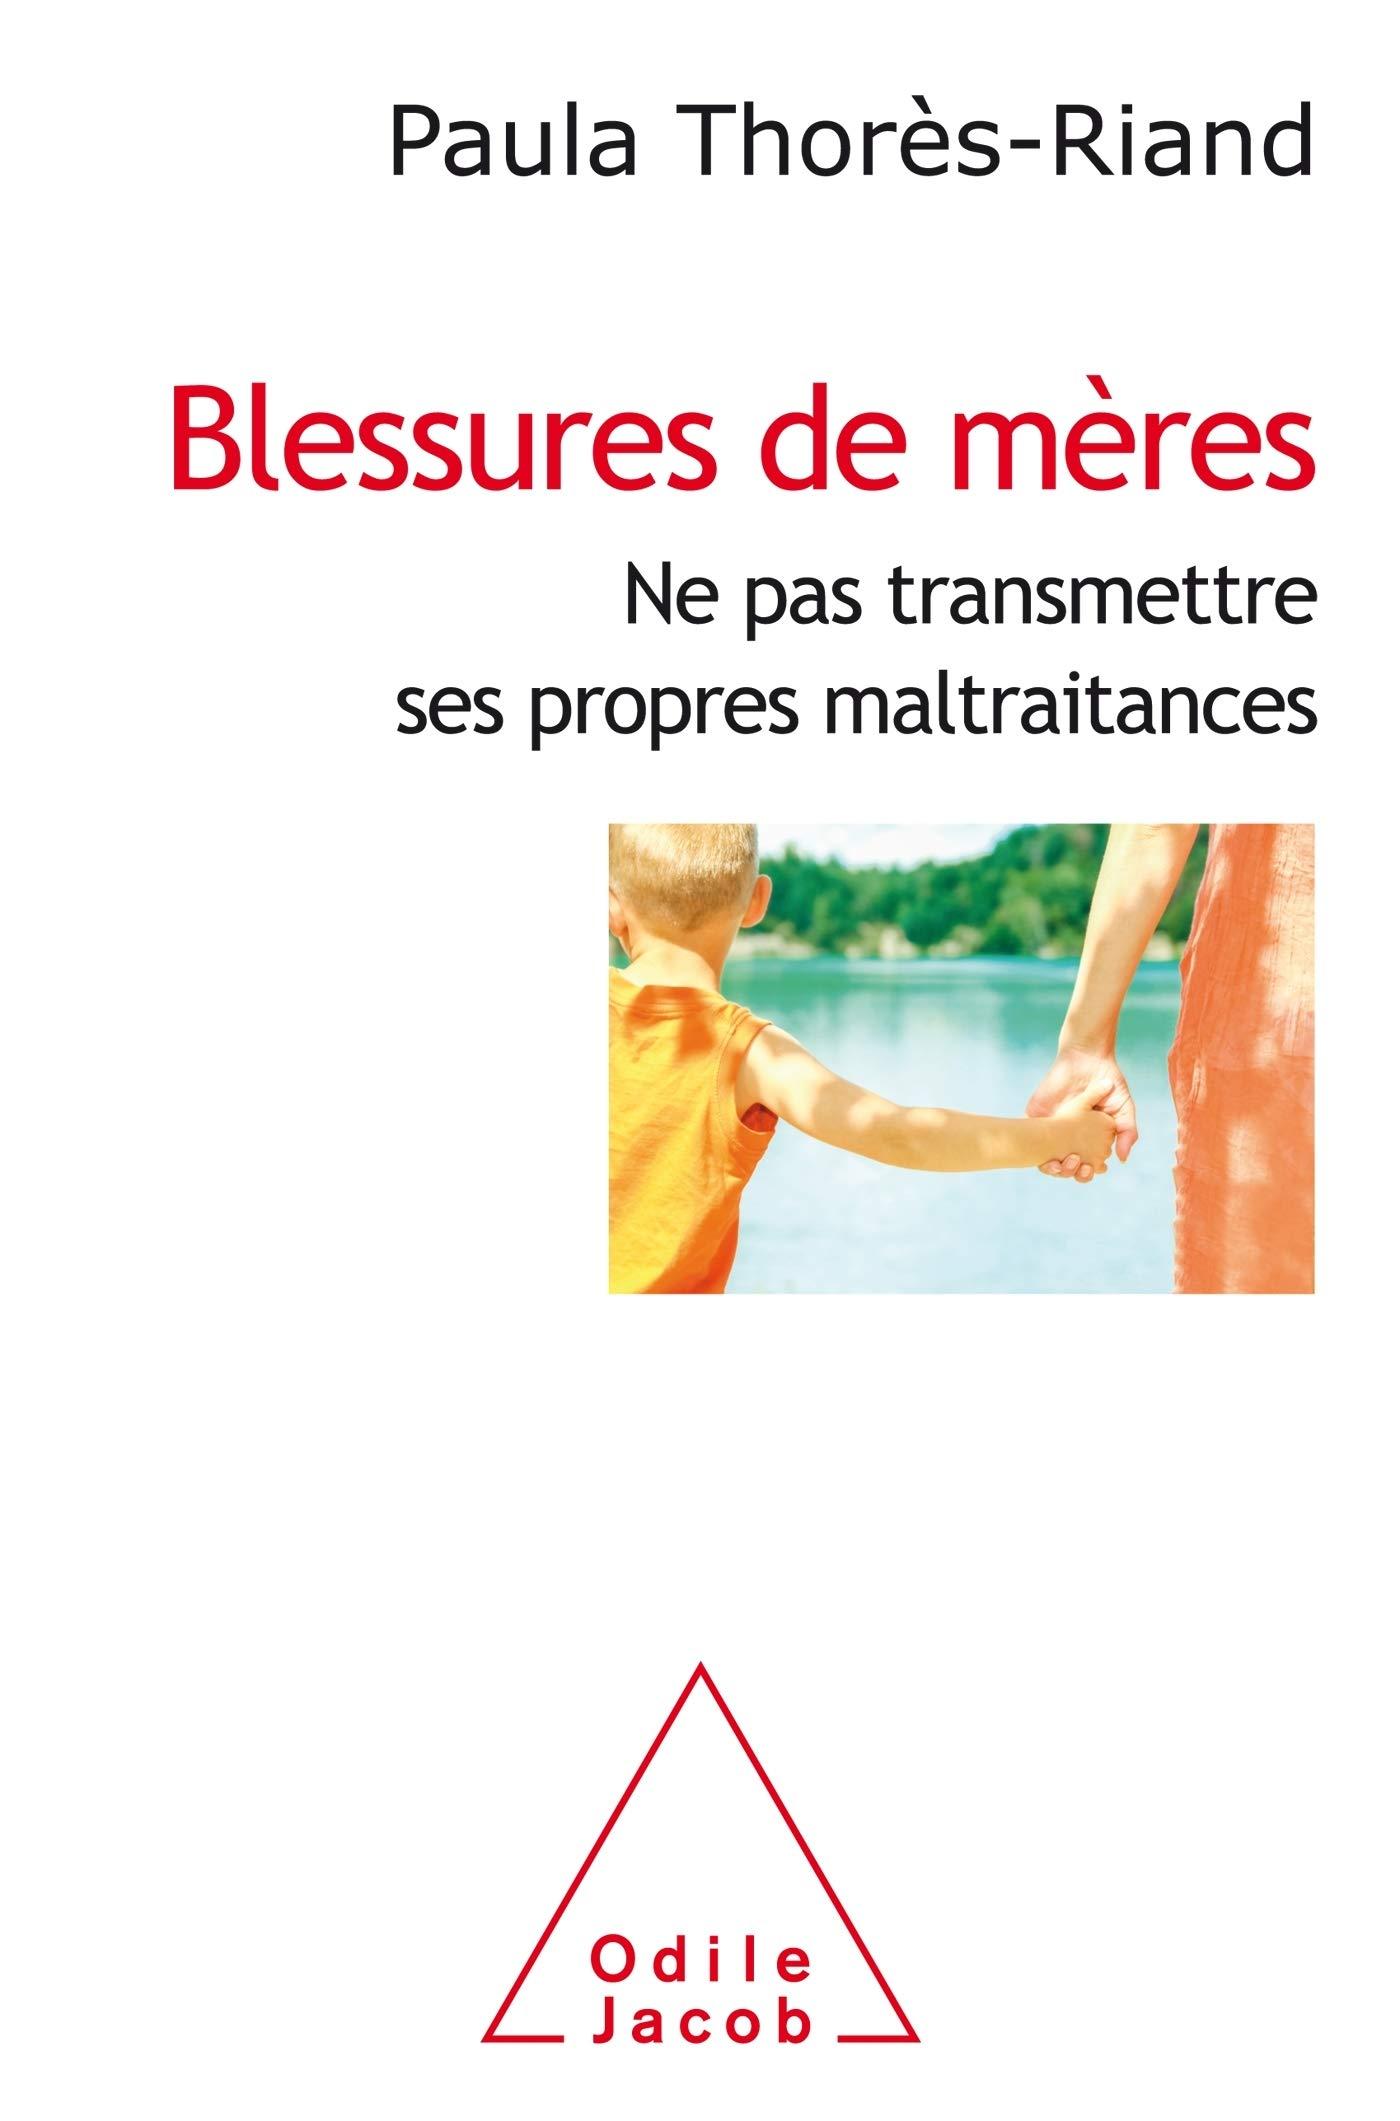 Blessures De Meres Oj Psychologie French Edition Thores Riand Paula 9782738149732 Amazon Com Books